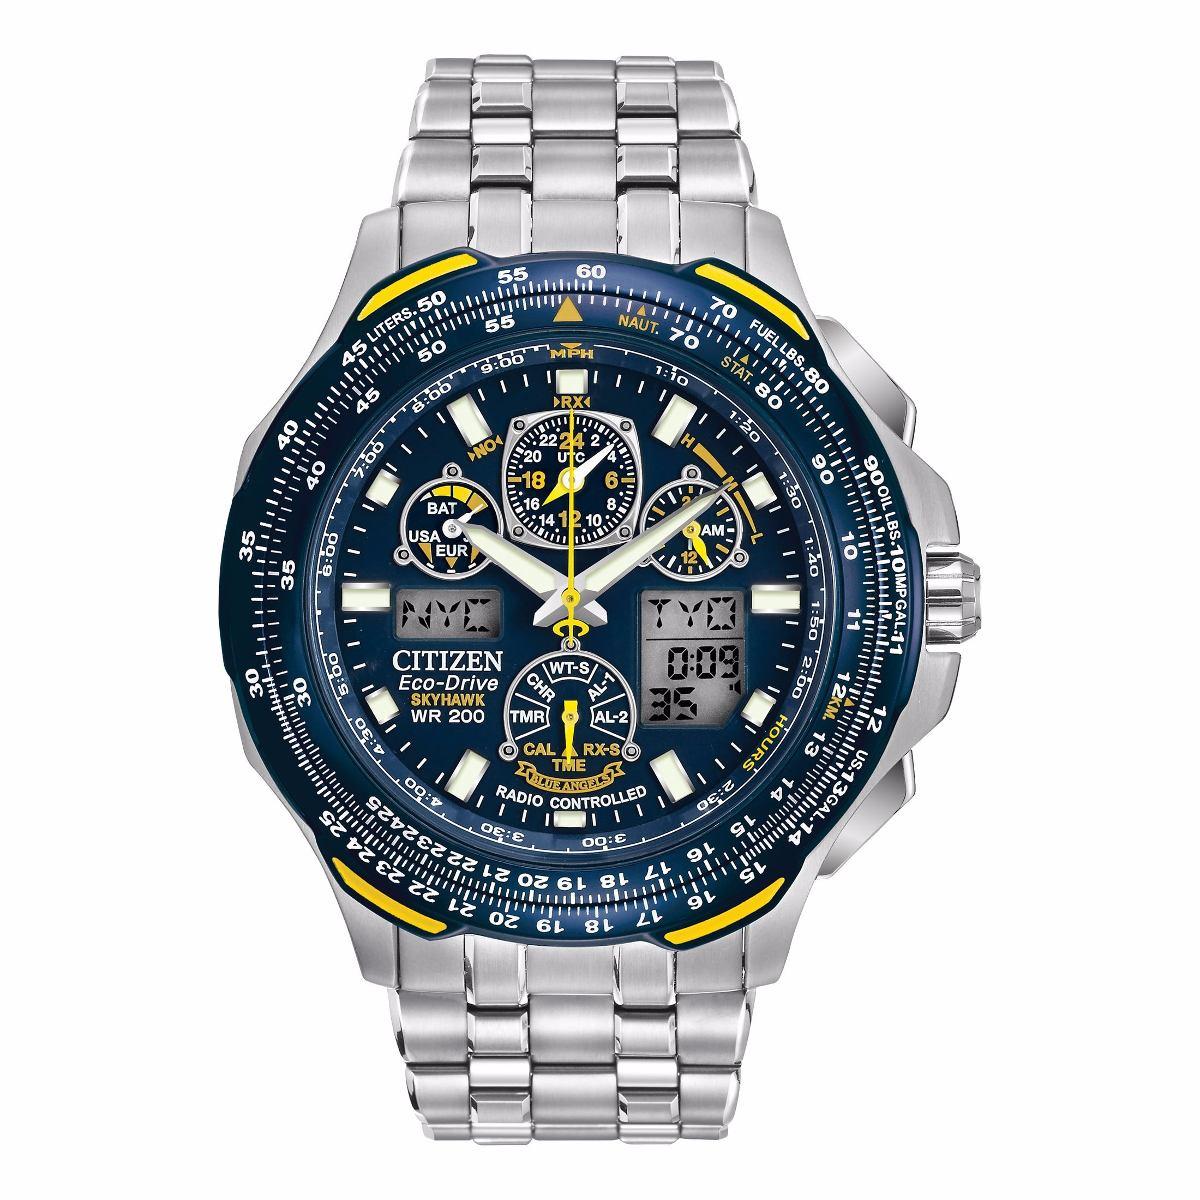 db402b670ff relógio masculino citizen blue angels jy050-55l titanium. Carregando zoom.